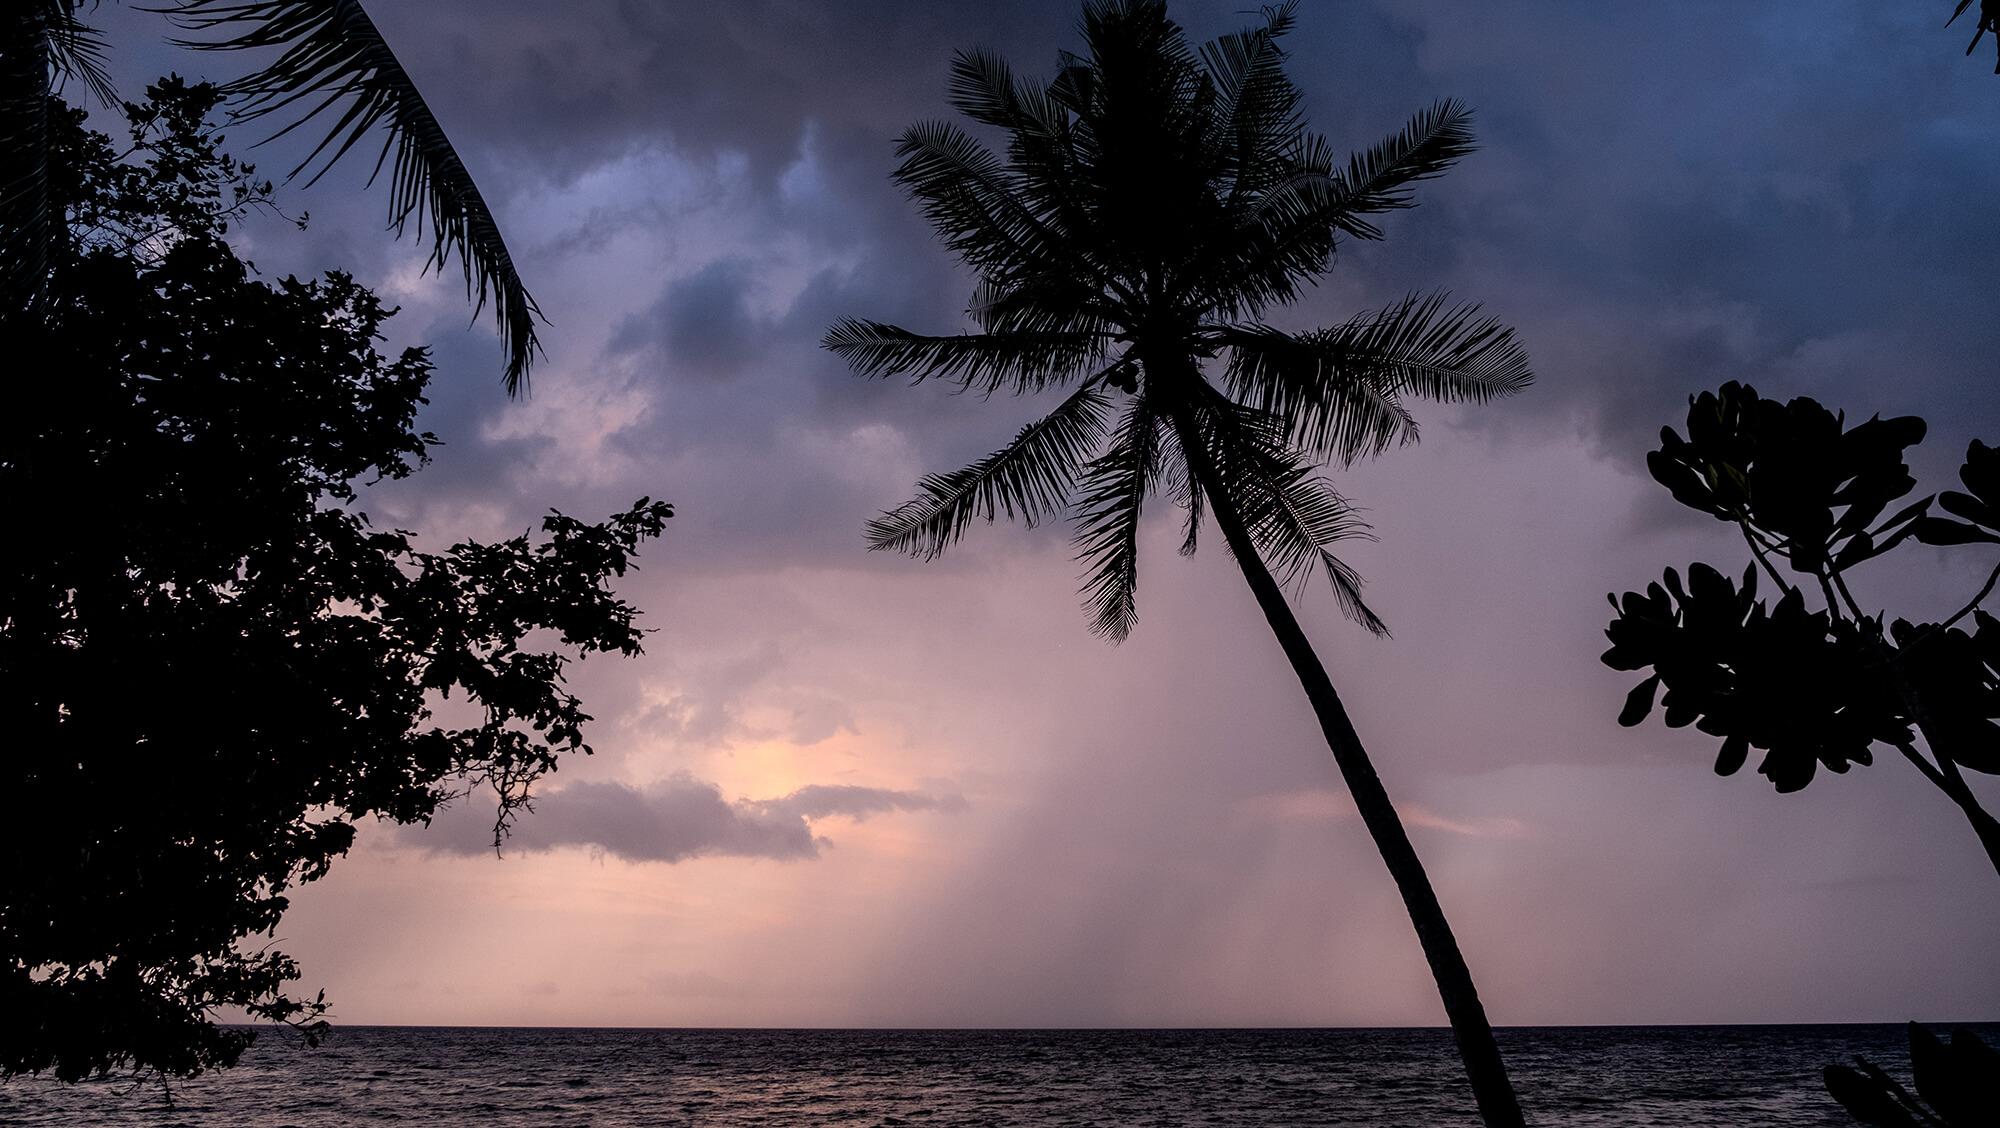 Atardecer en púrpura en la isla de Malenge en Sulawesi